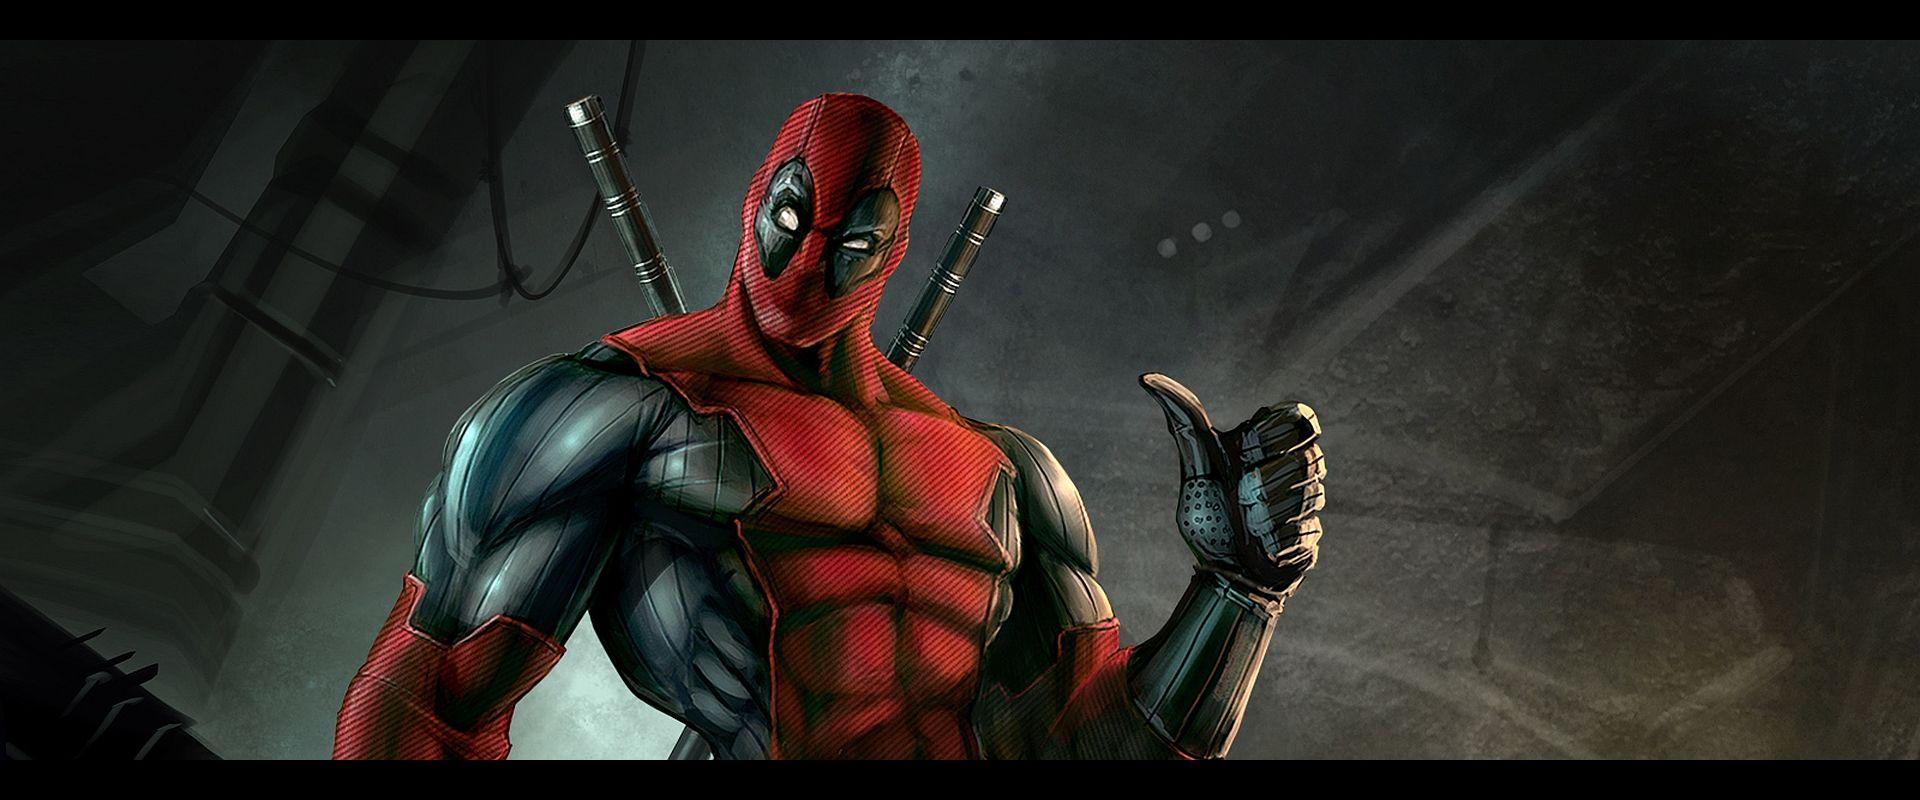 Deadpool Tablet Wallpapers Top Free Deadpool Tablet Backgrounds